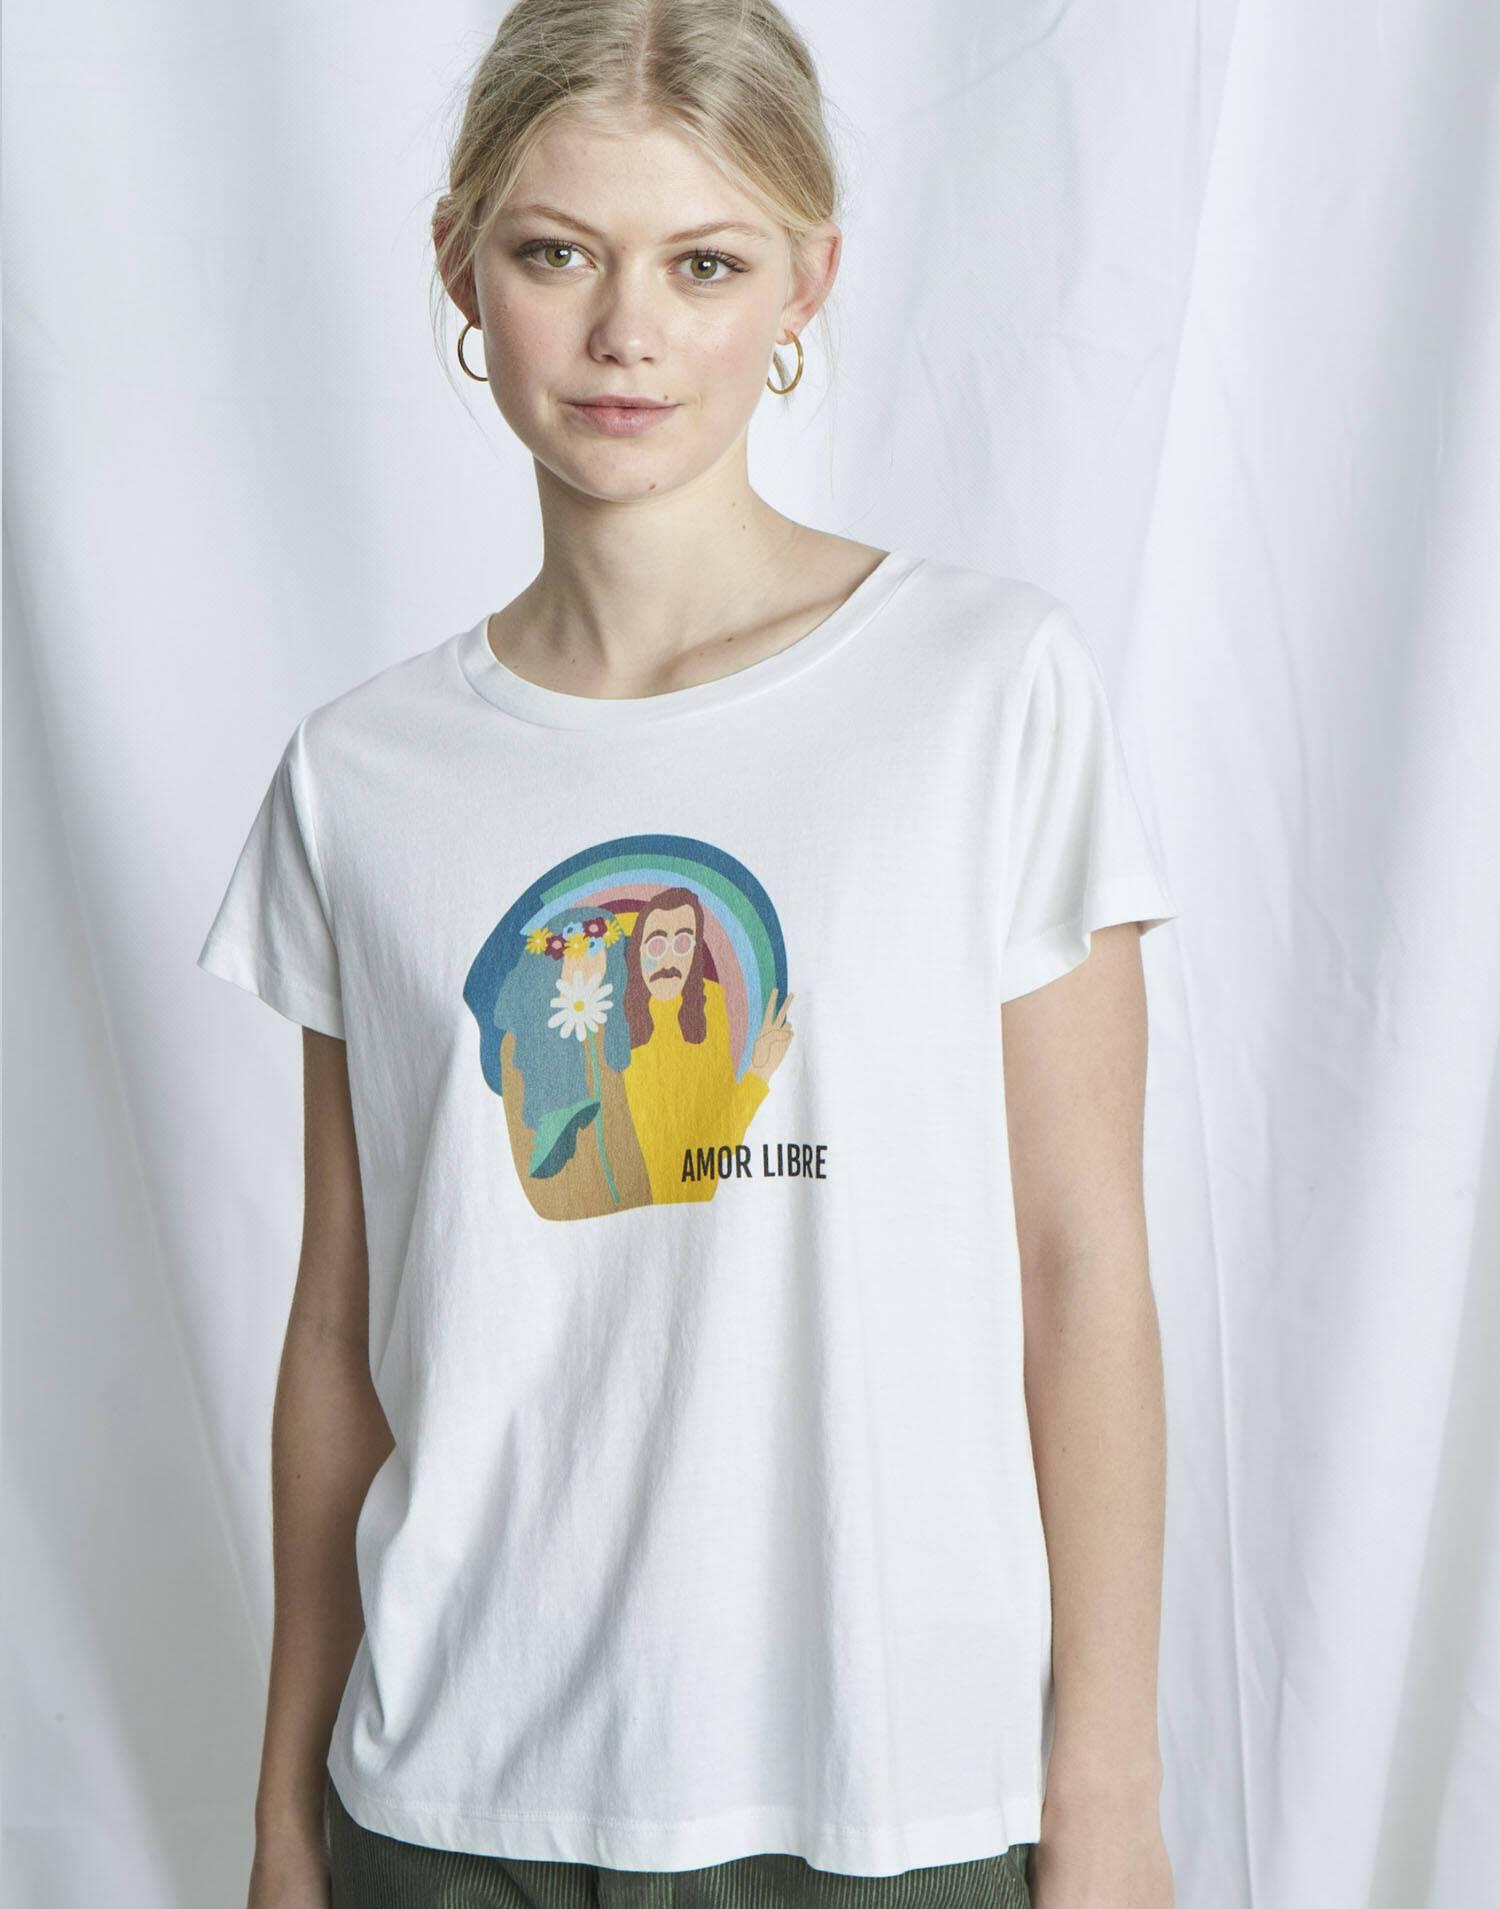 Amor libre organic t-shirt